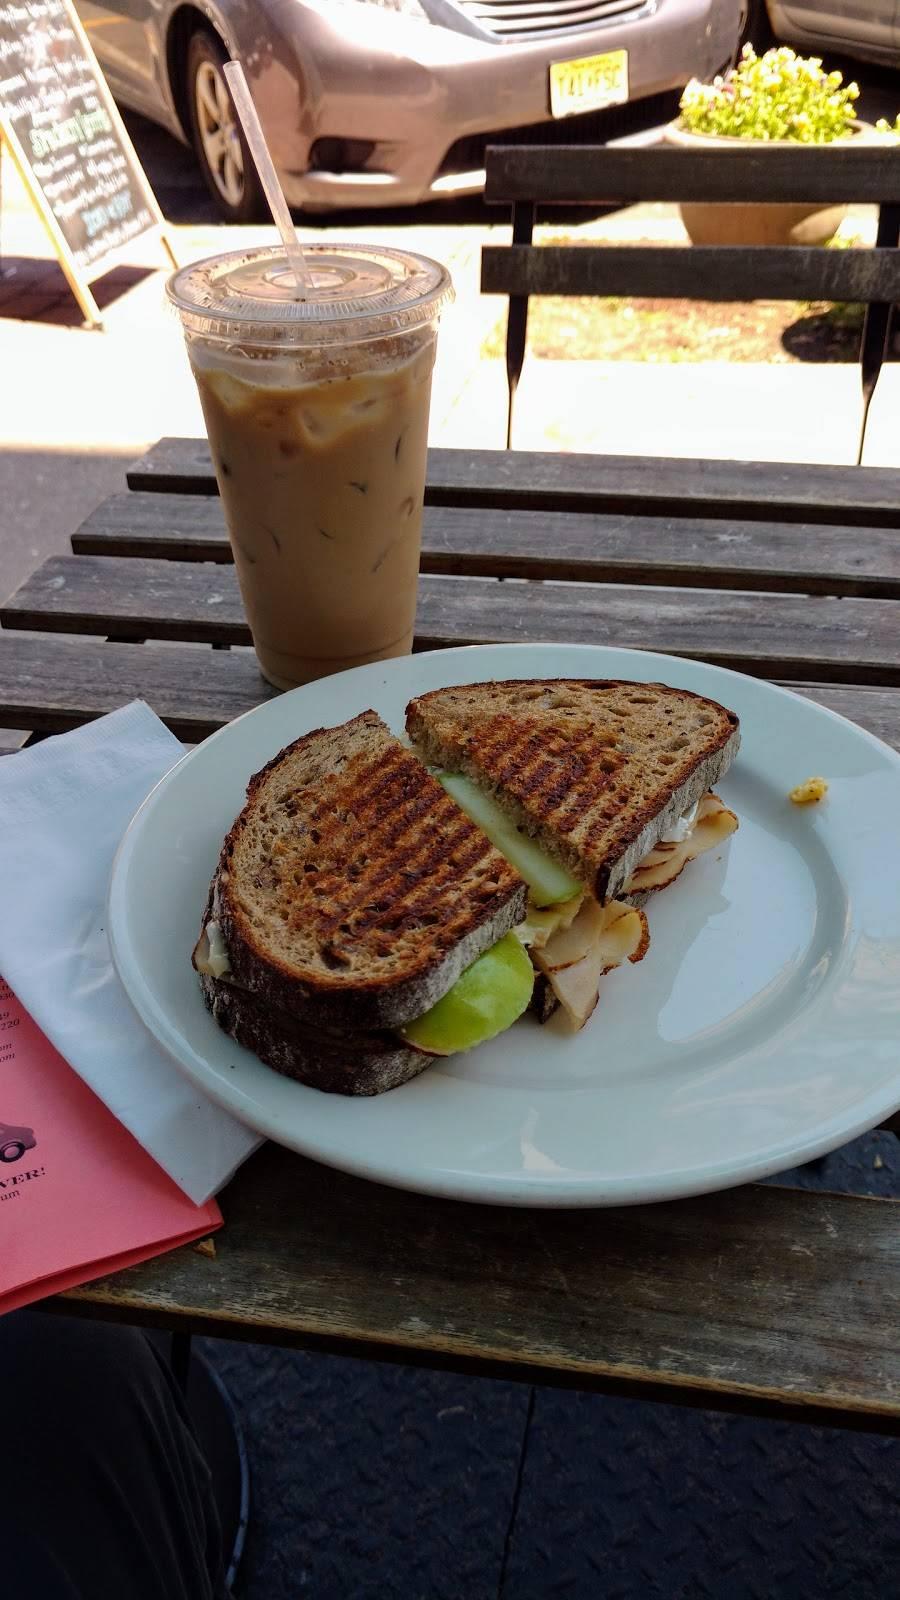 The Little Grocery Uptown | cafe | 1212 Washington St, Hoboken, NJ 07030, USA | 2015264949 OR +1 201-526-4949